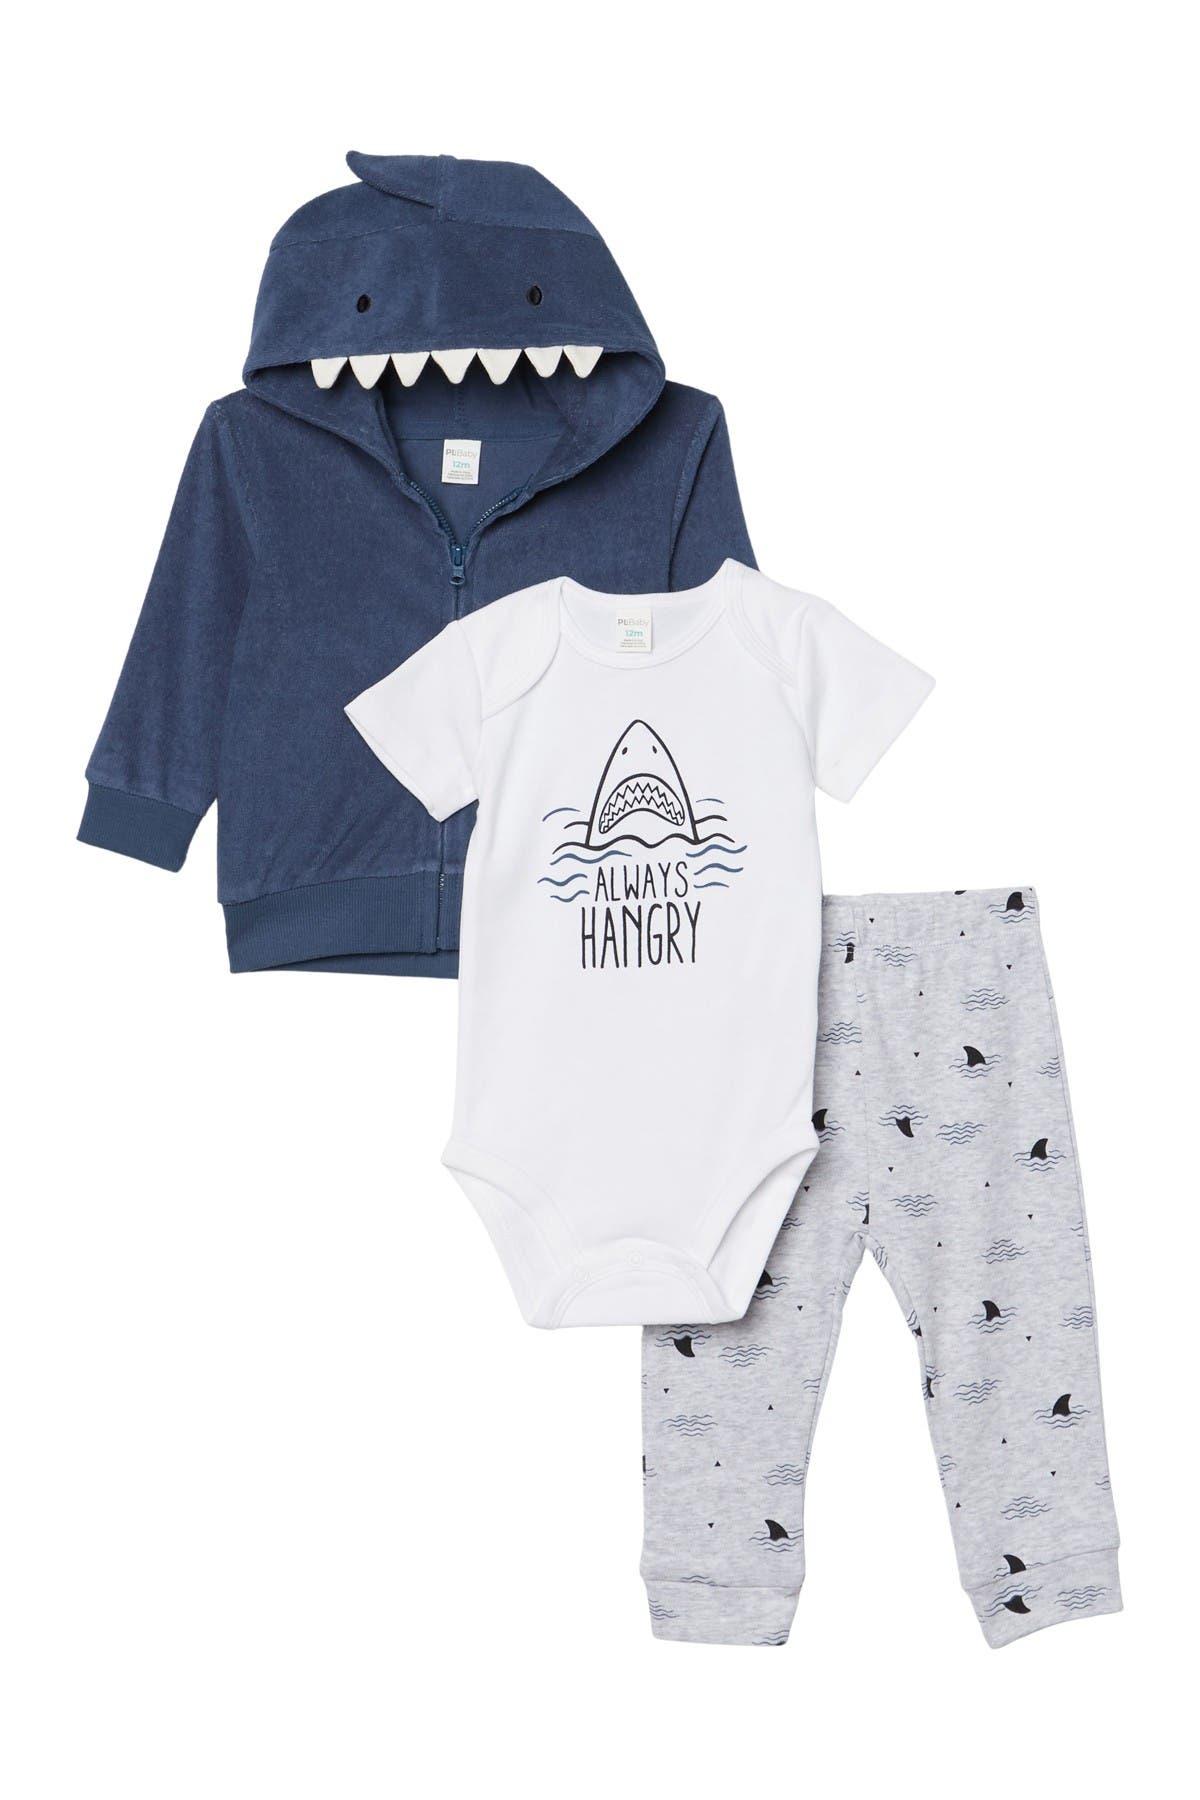 Image of PL Baby by Petit Lem Shark Print Hoodie, Bodysuit, & Bottoms 3-Piece Set